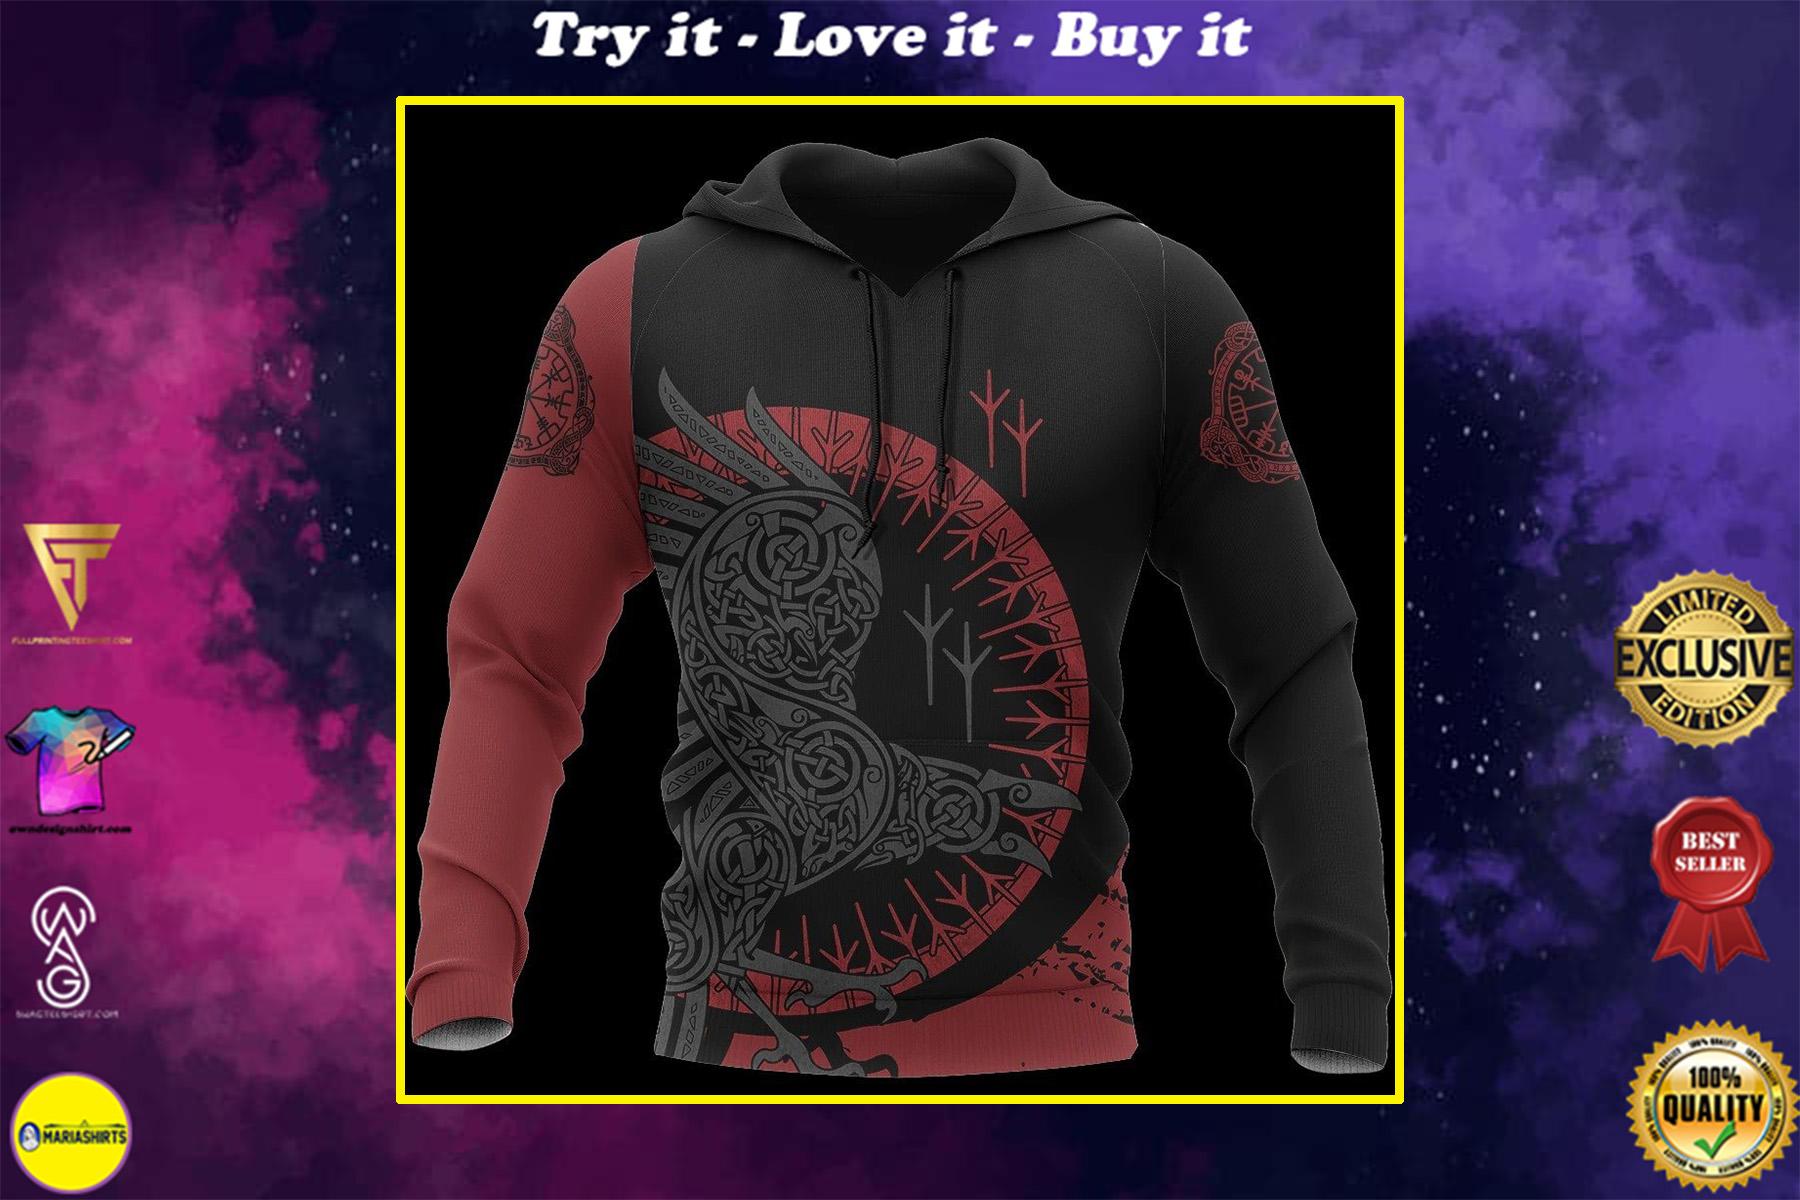 viking raven all over printed shirt